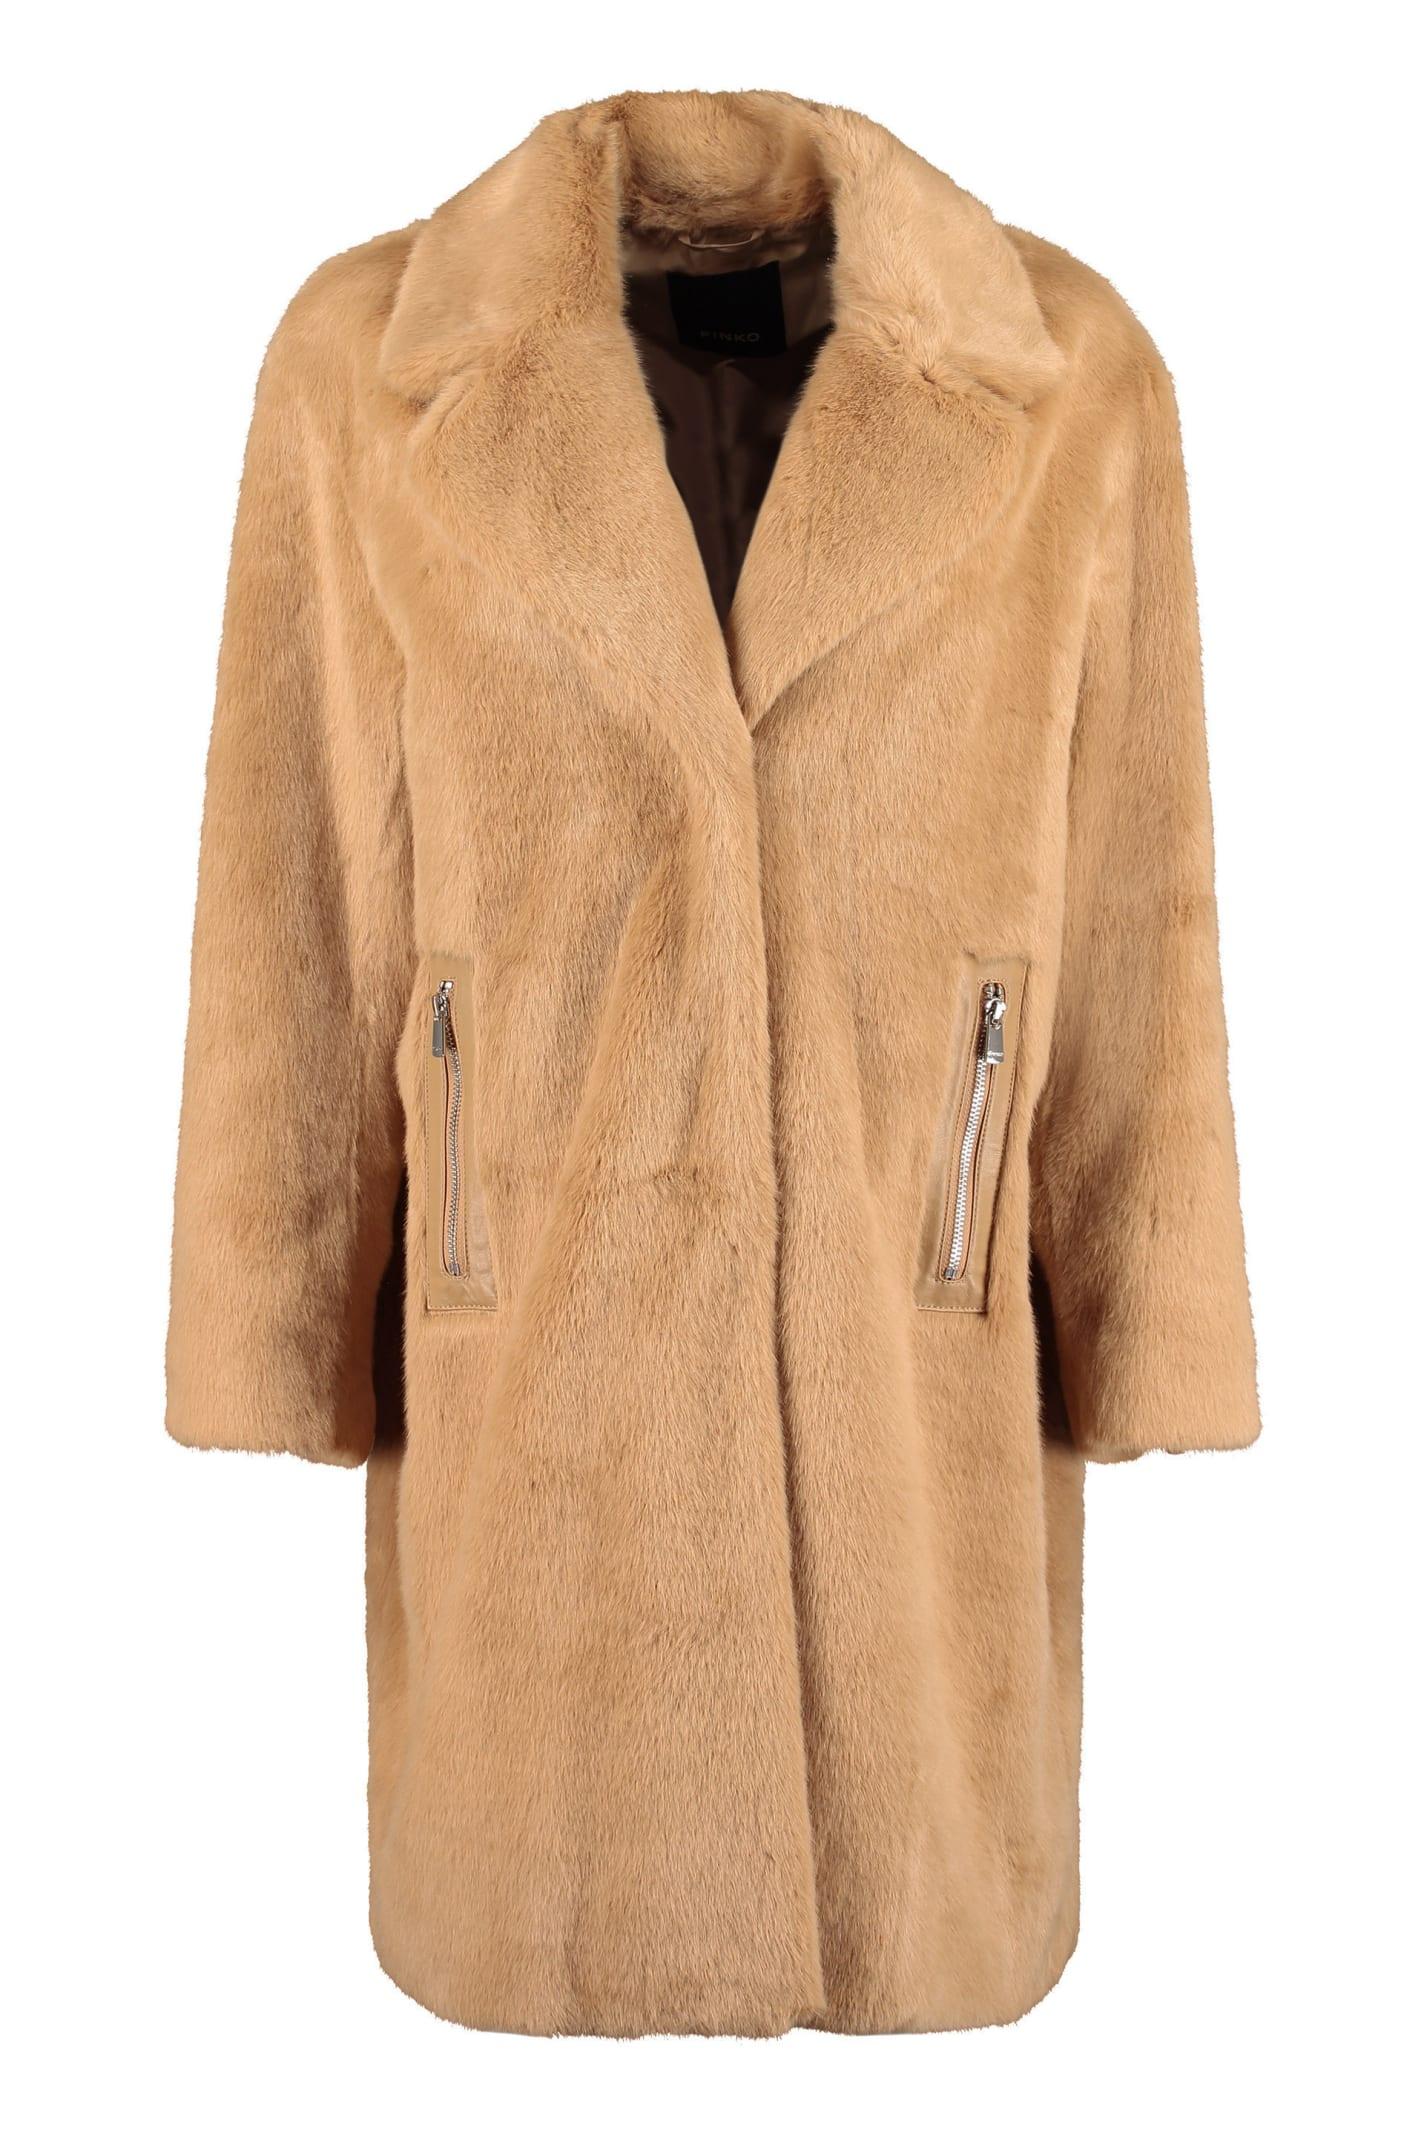 Pinko Evaristo Faux Fur Coat